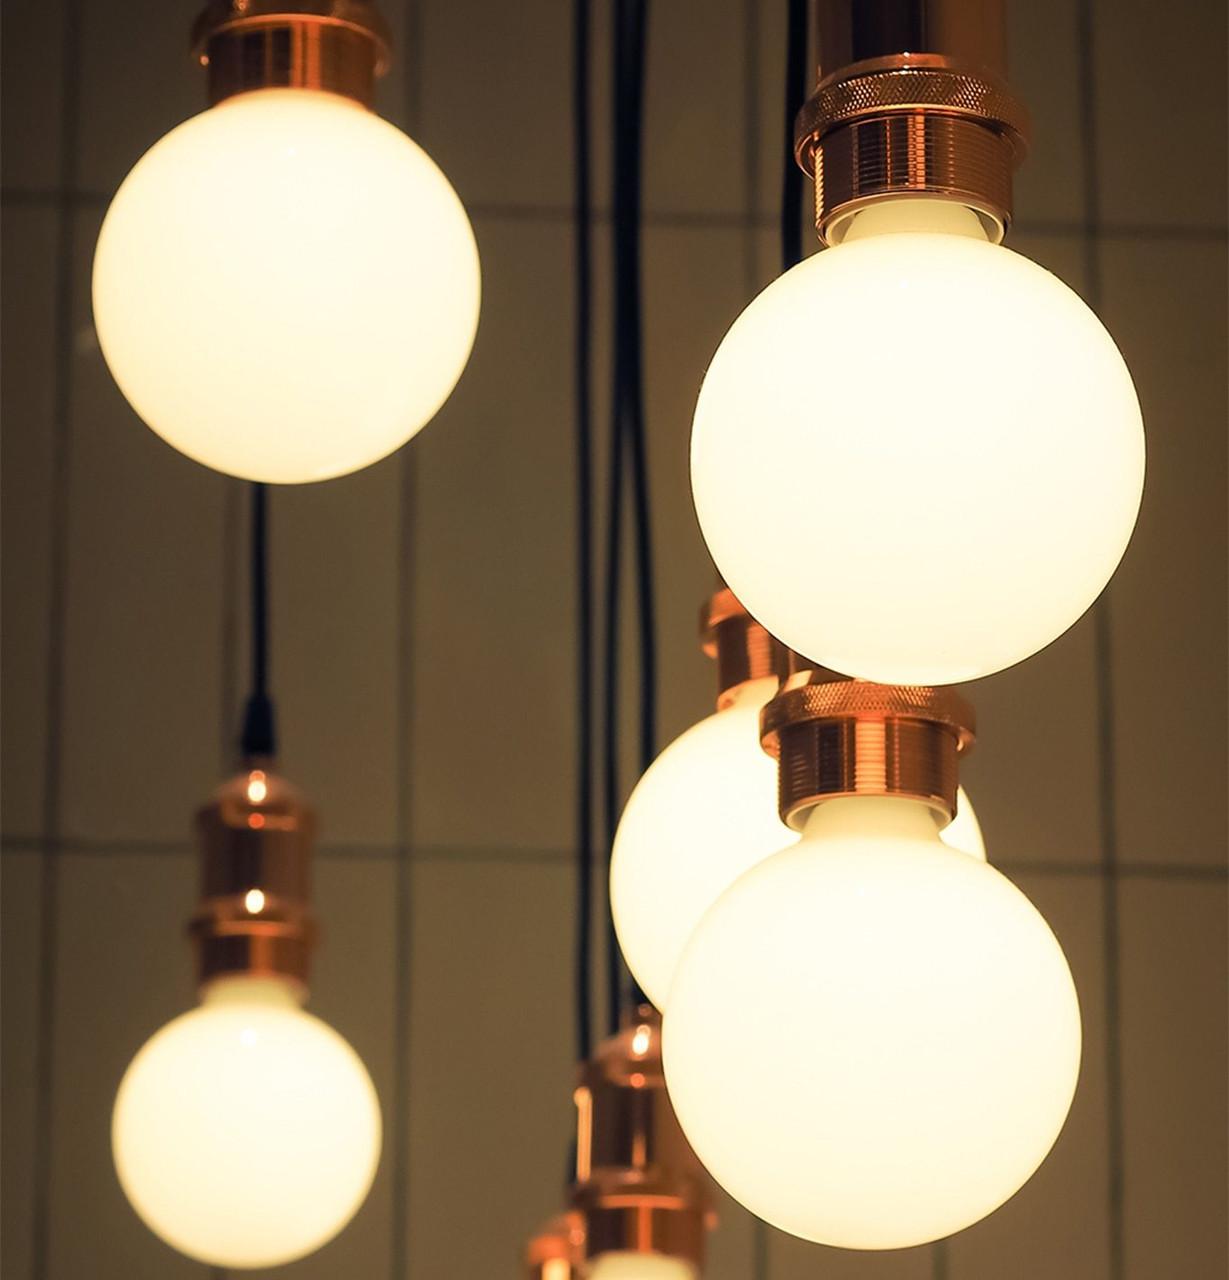 Crompton Lamps LED G125 B22 Light Bulbs